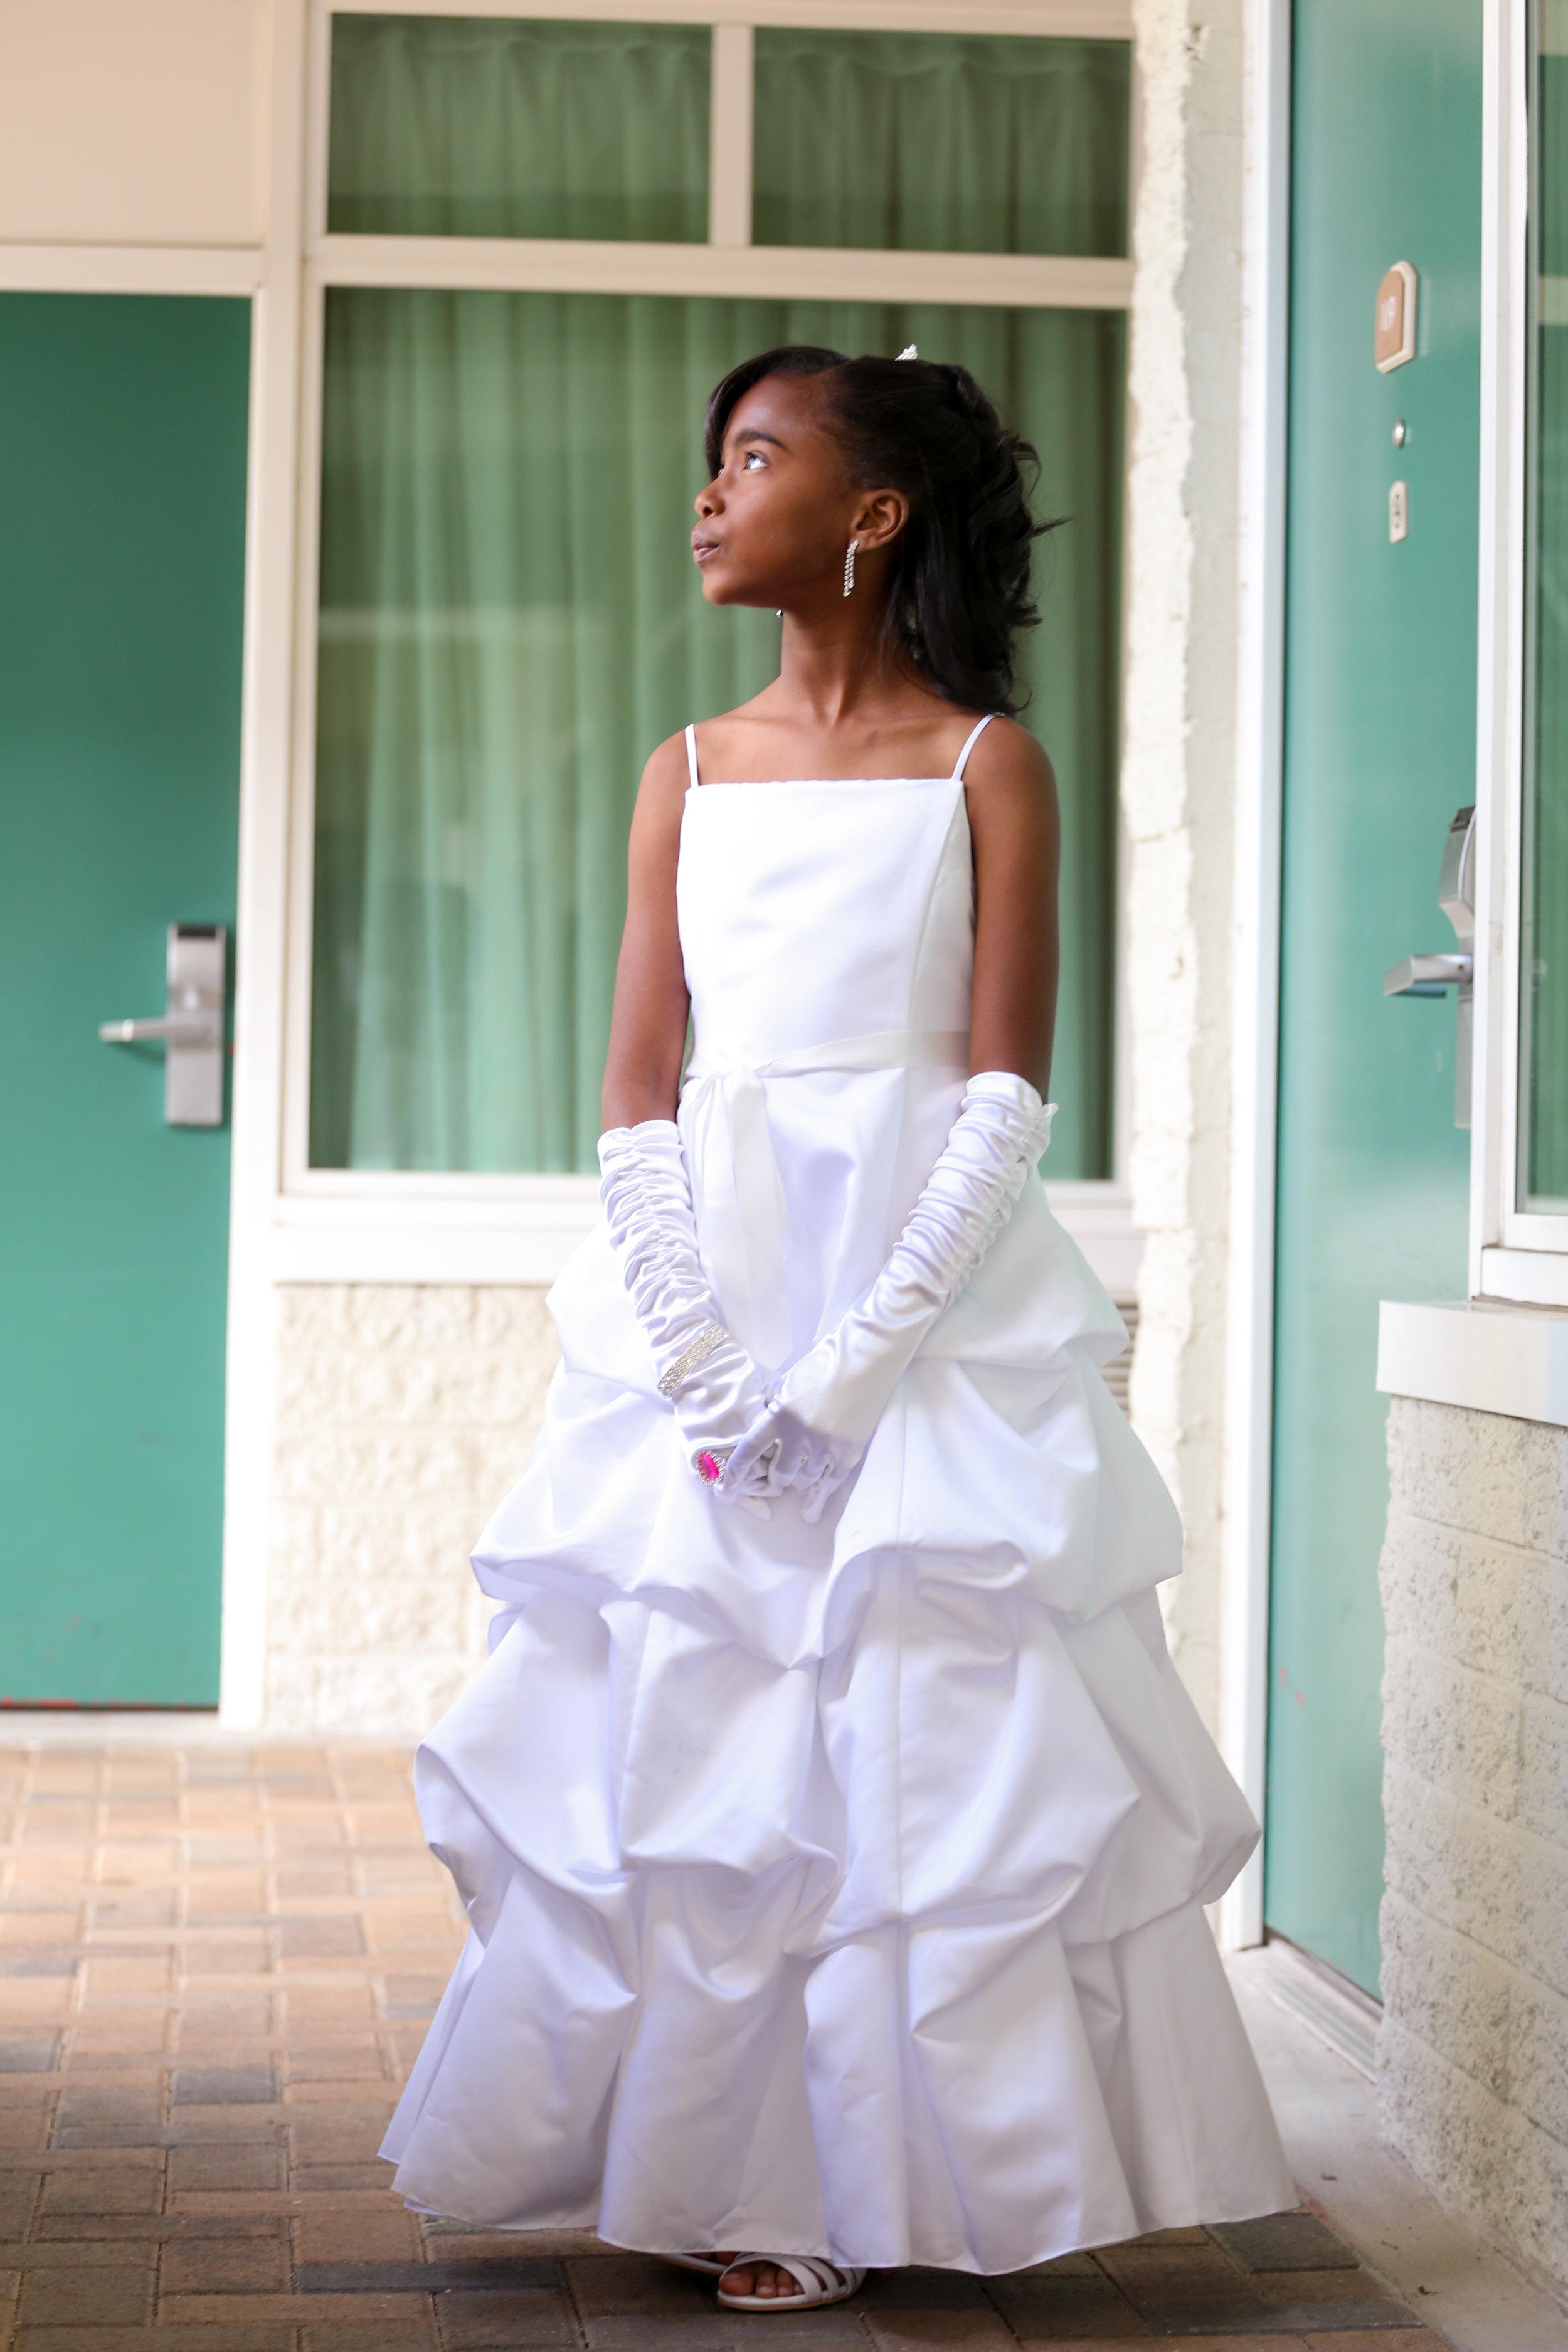 5-24-14_Errol Ebanks_The Finney Wedding_0203.jpg